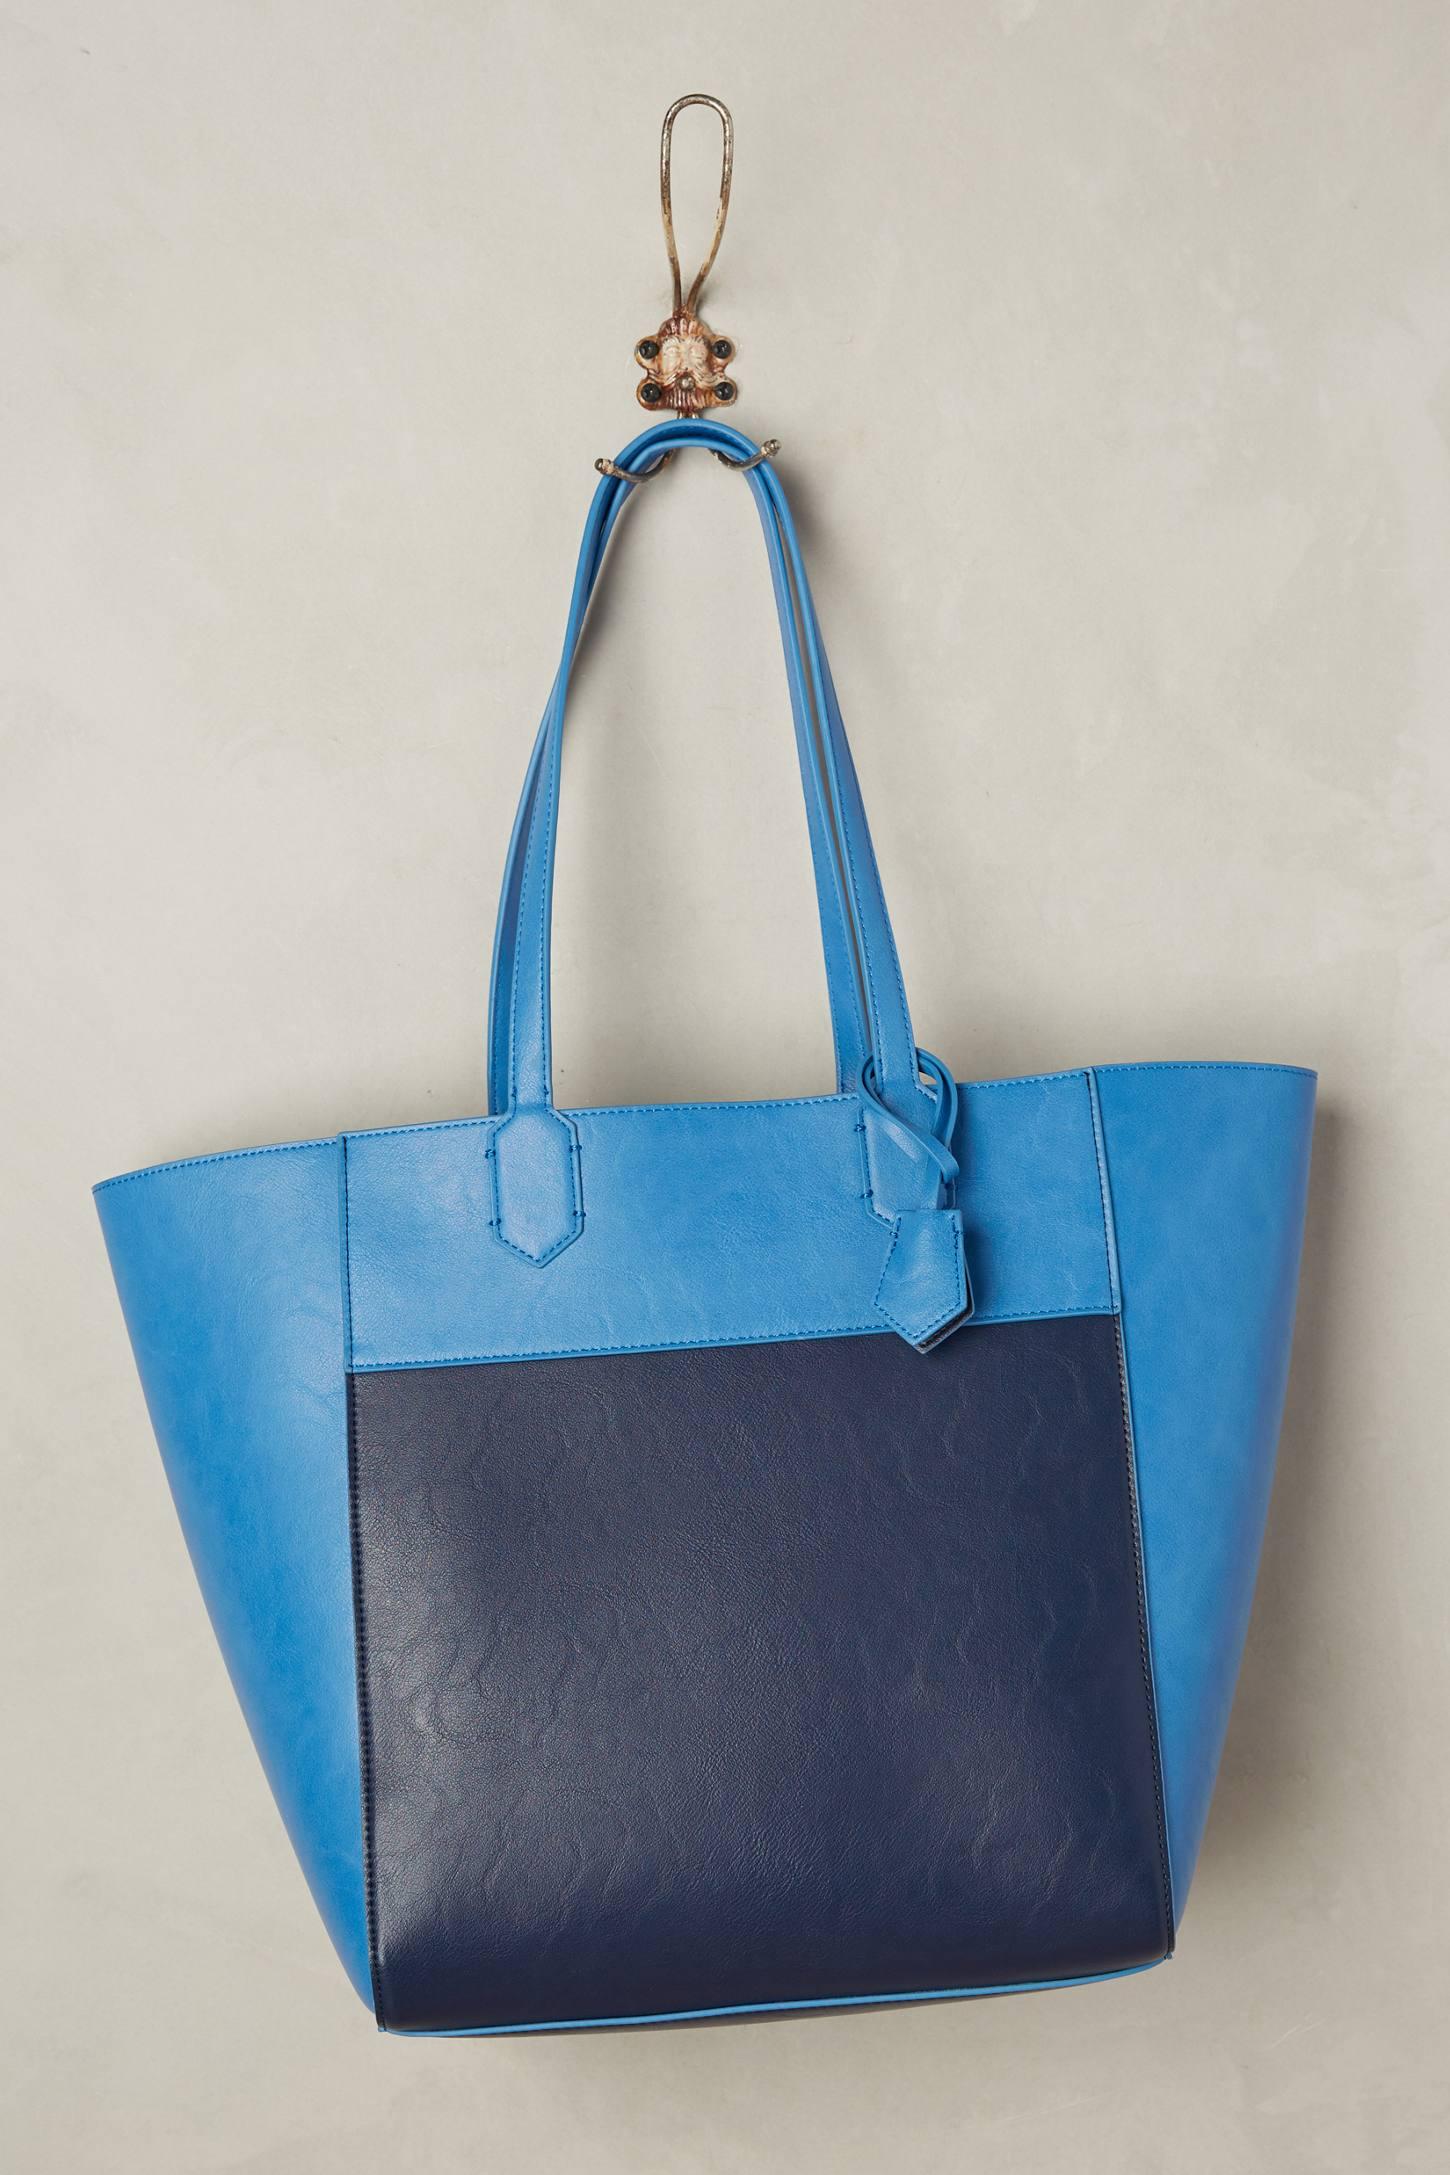 a108343d9b4f Colorful Everyday Handbags